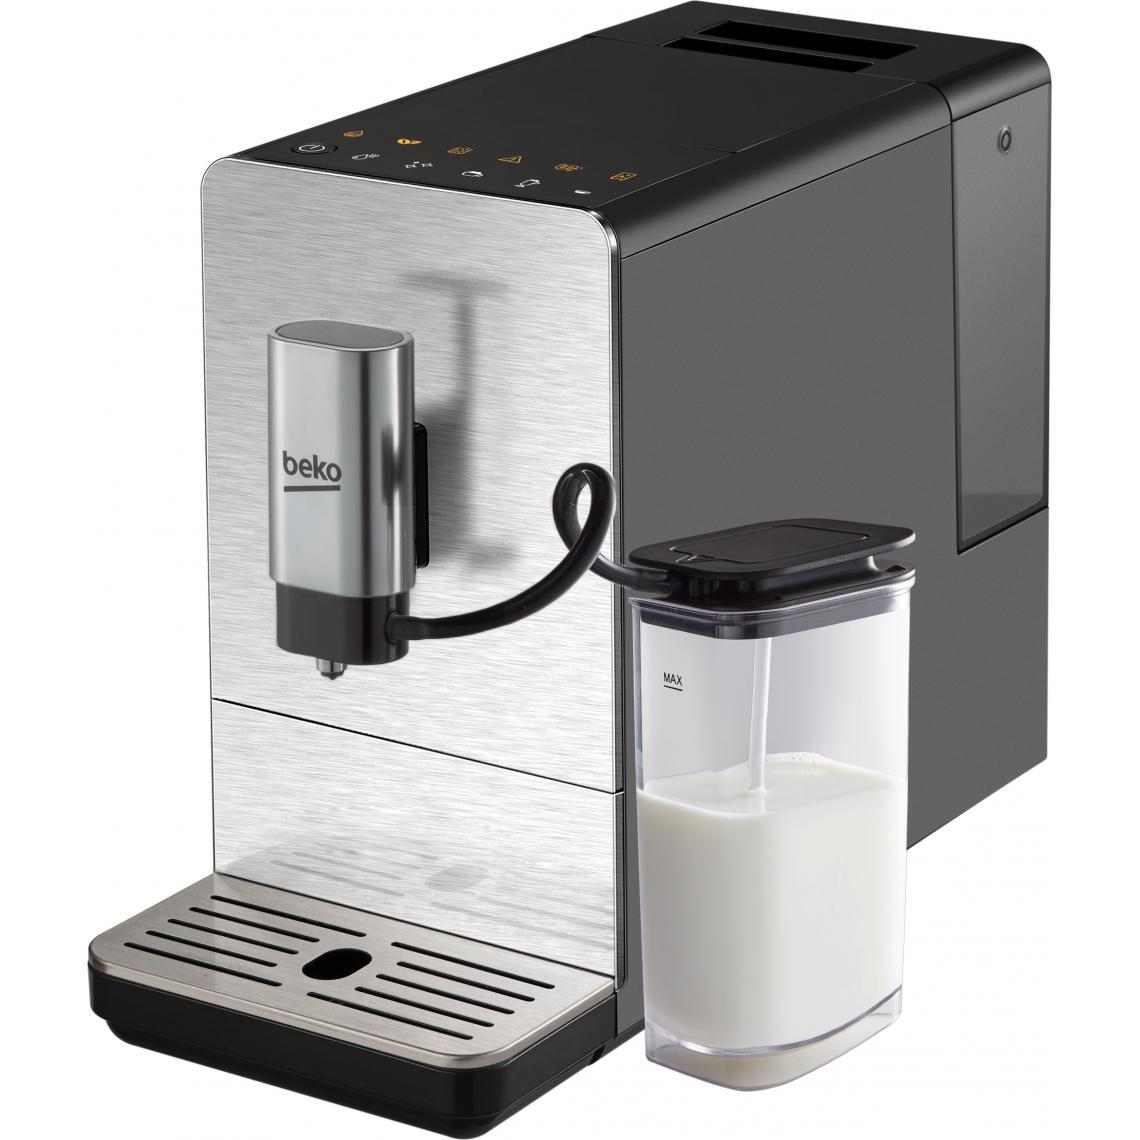 Beko Machine à café Expresso broyeur CEG5331X - Argent